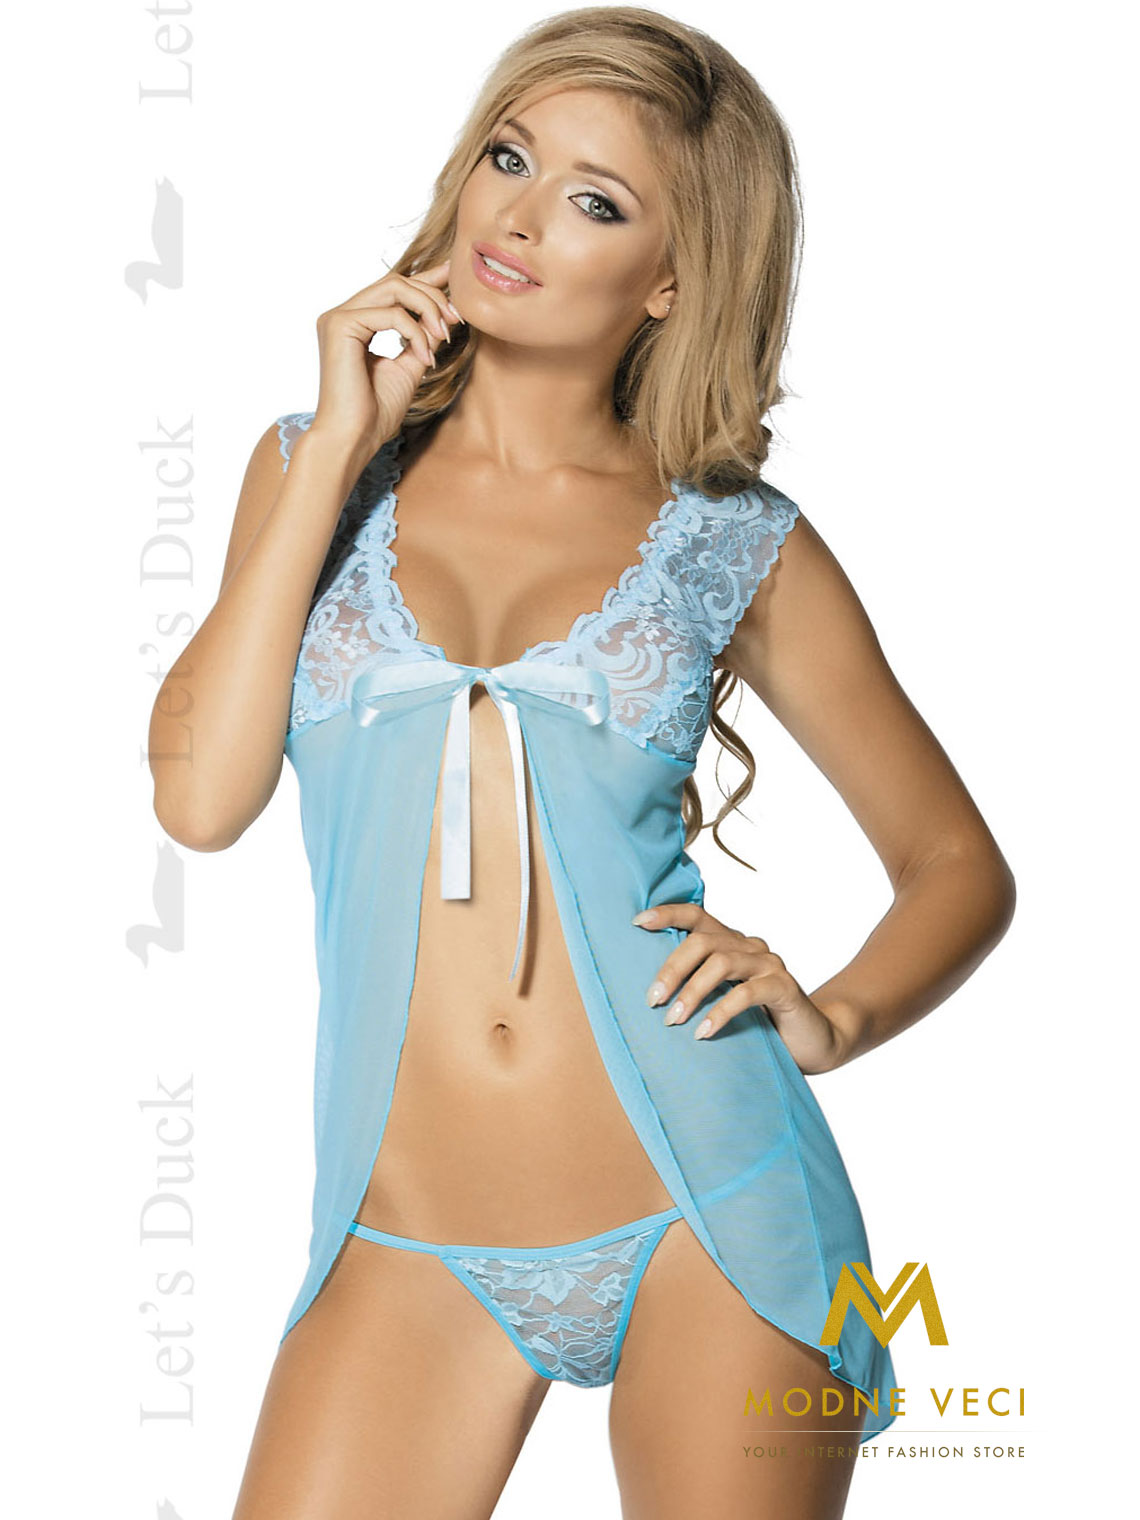 4e731a400c68 Luxusné dámske spodné prádlo košielka